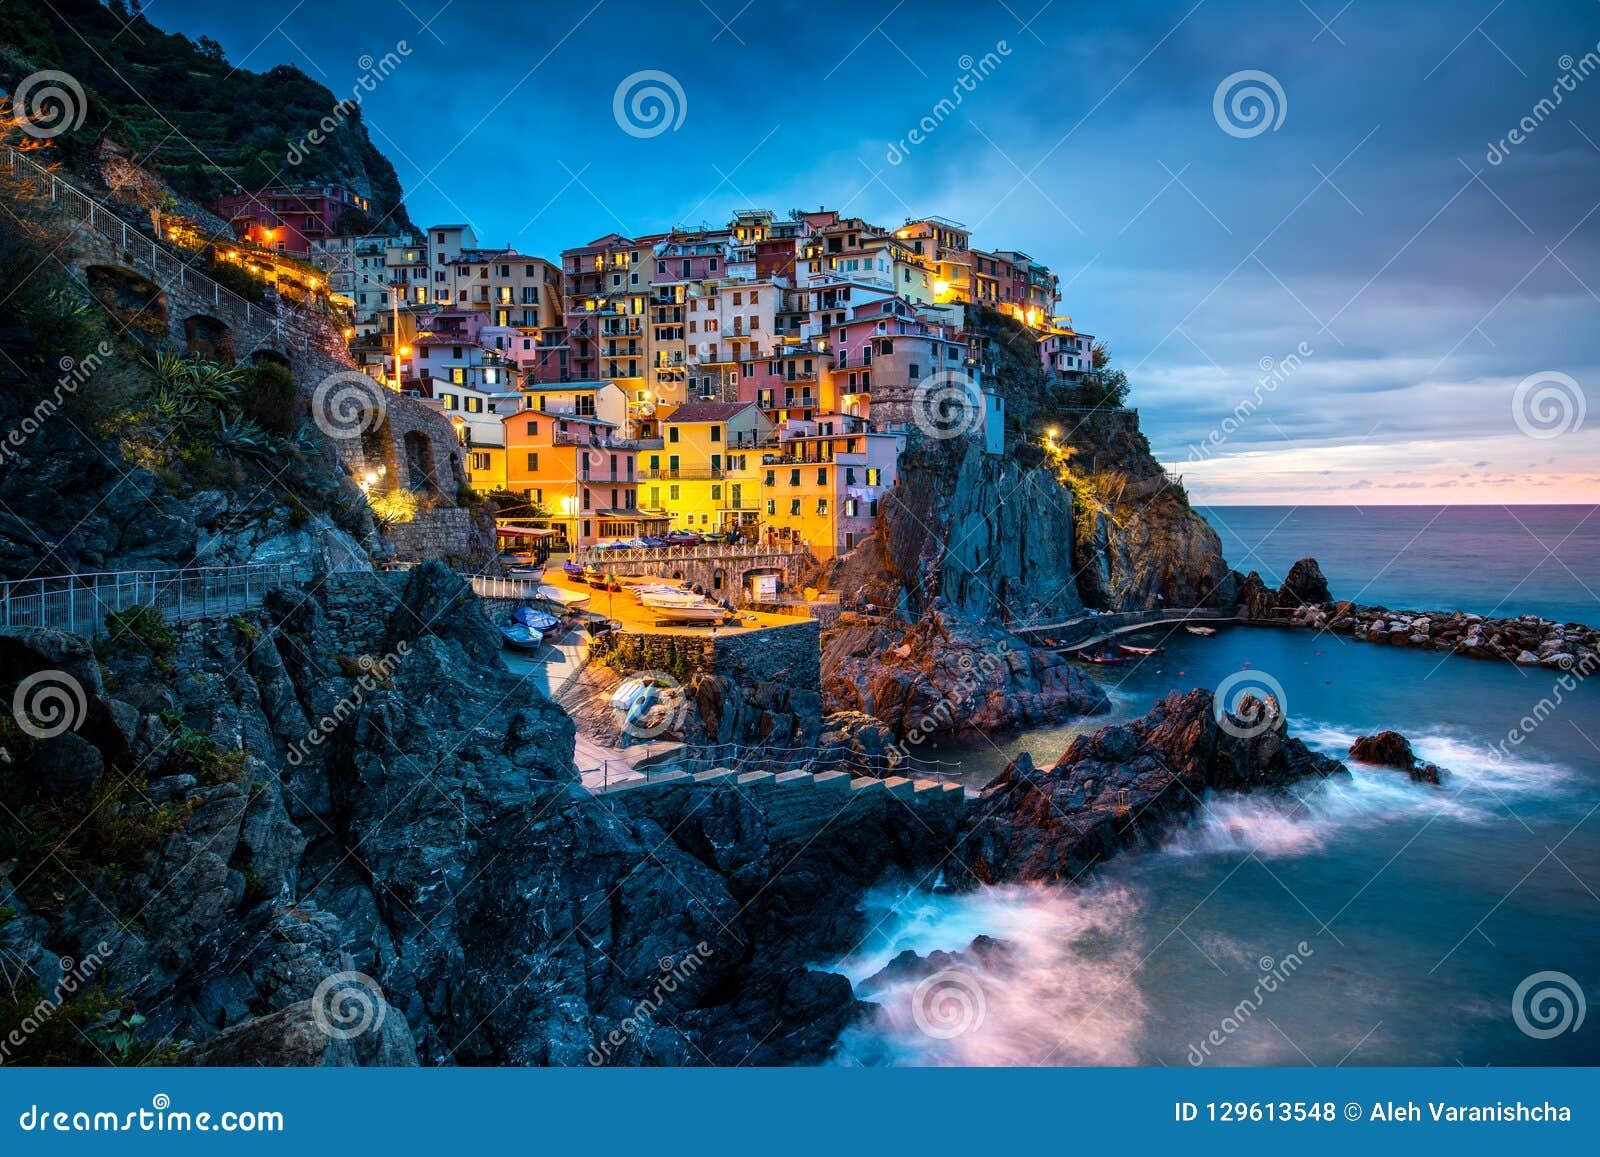 Manaroladorp, Cinque Terre Coast van Italië Manarola een mooie kleine stad in de provincie van La Spezia, Ligurië, het noorden va